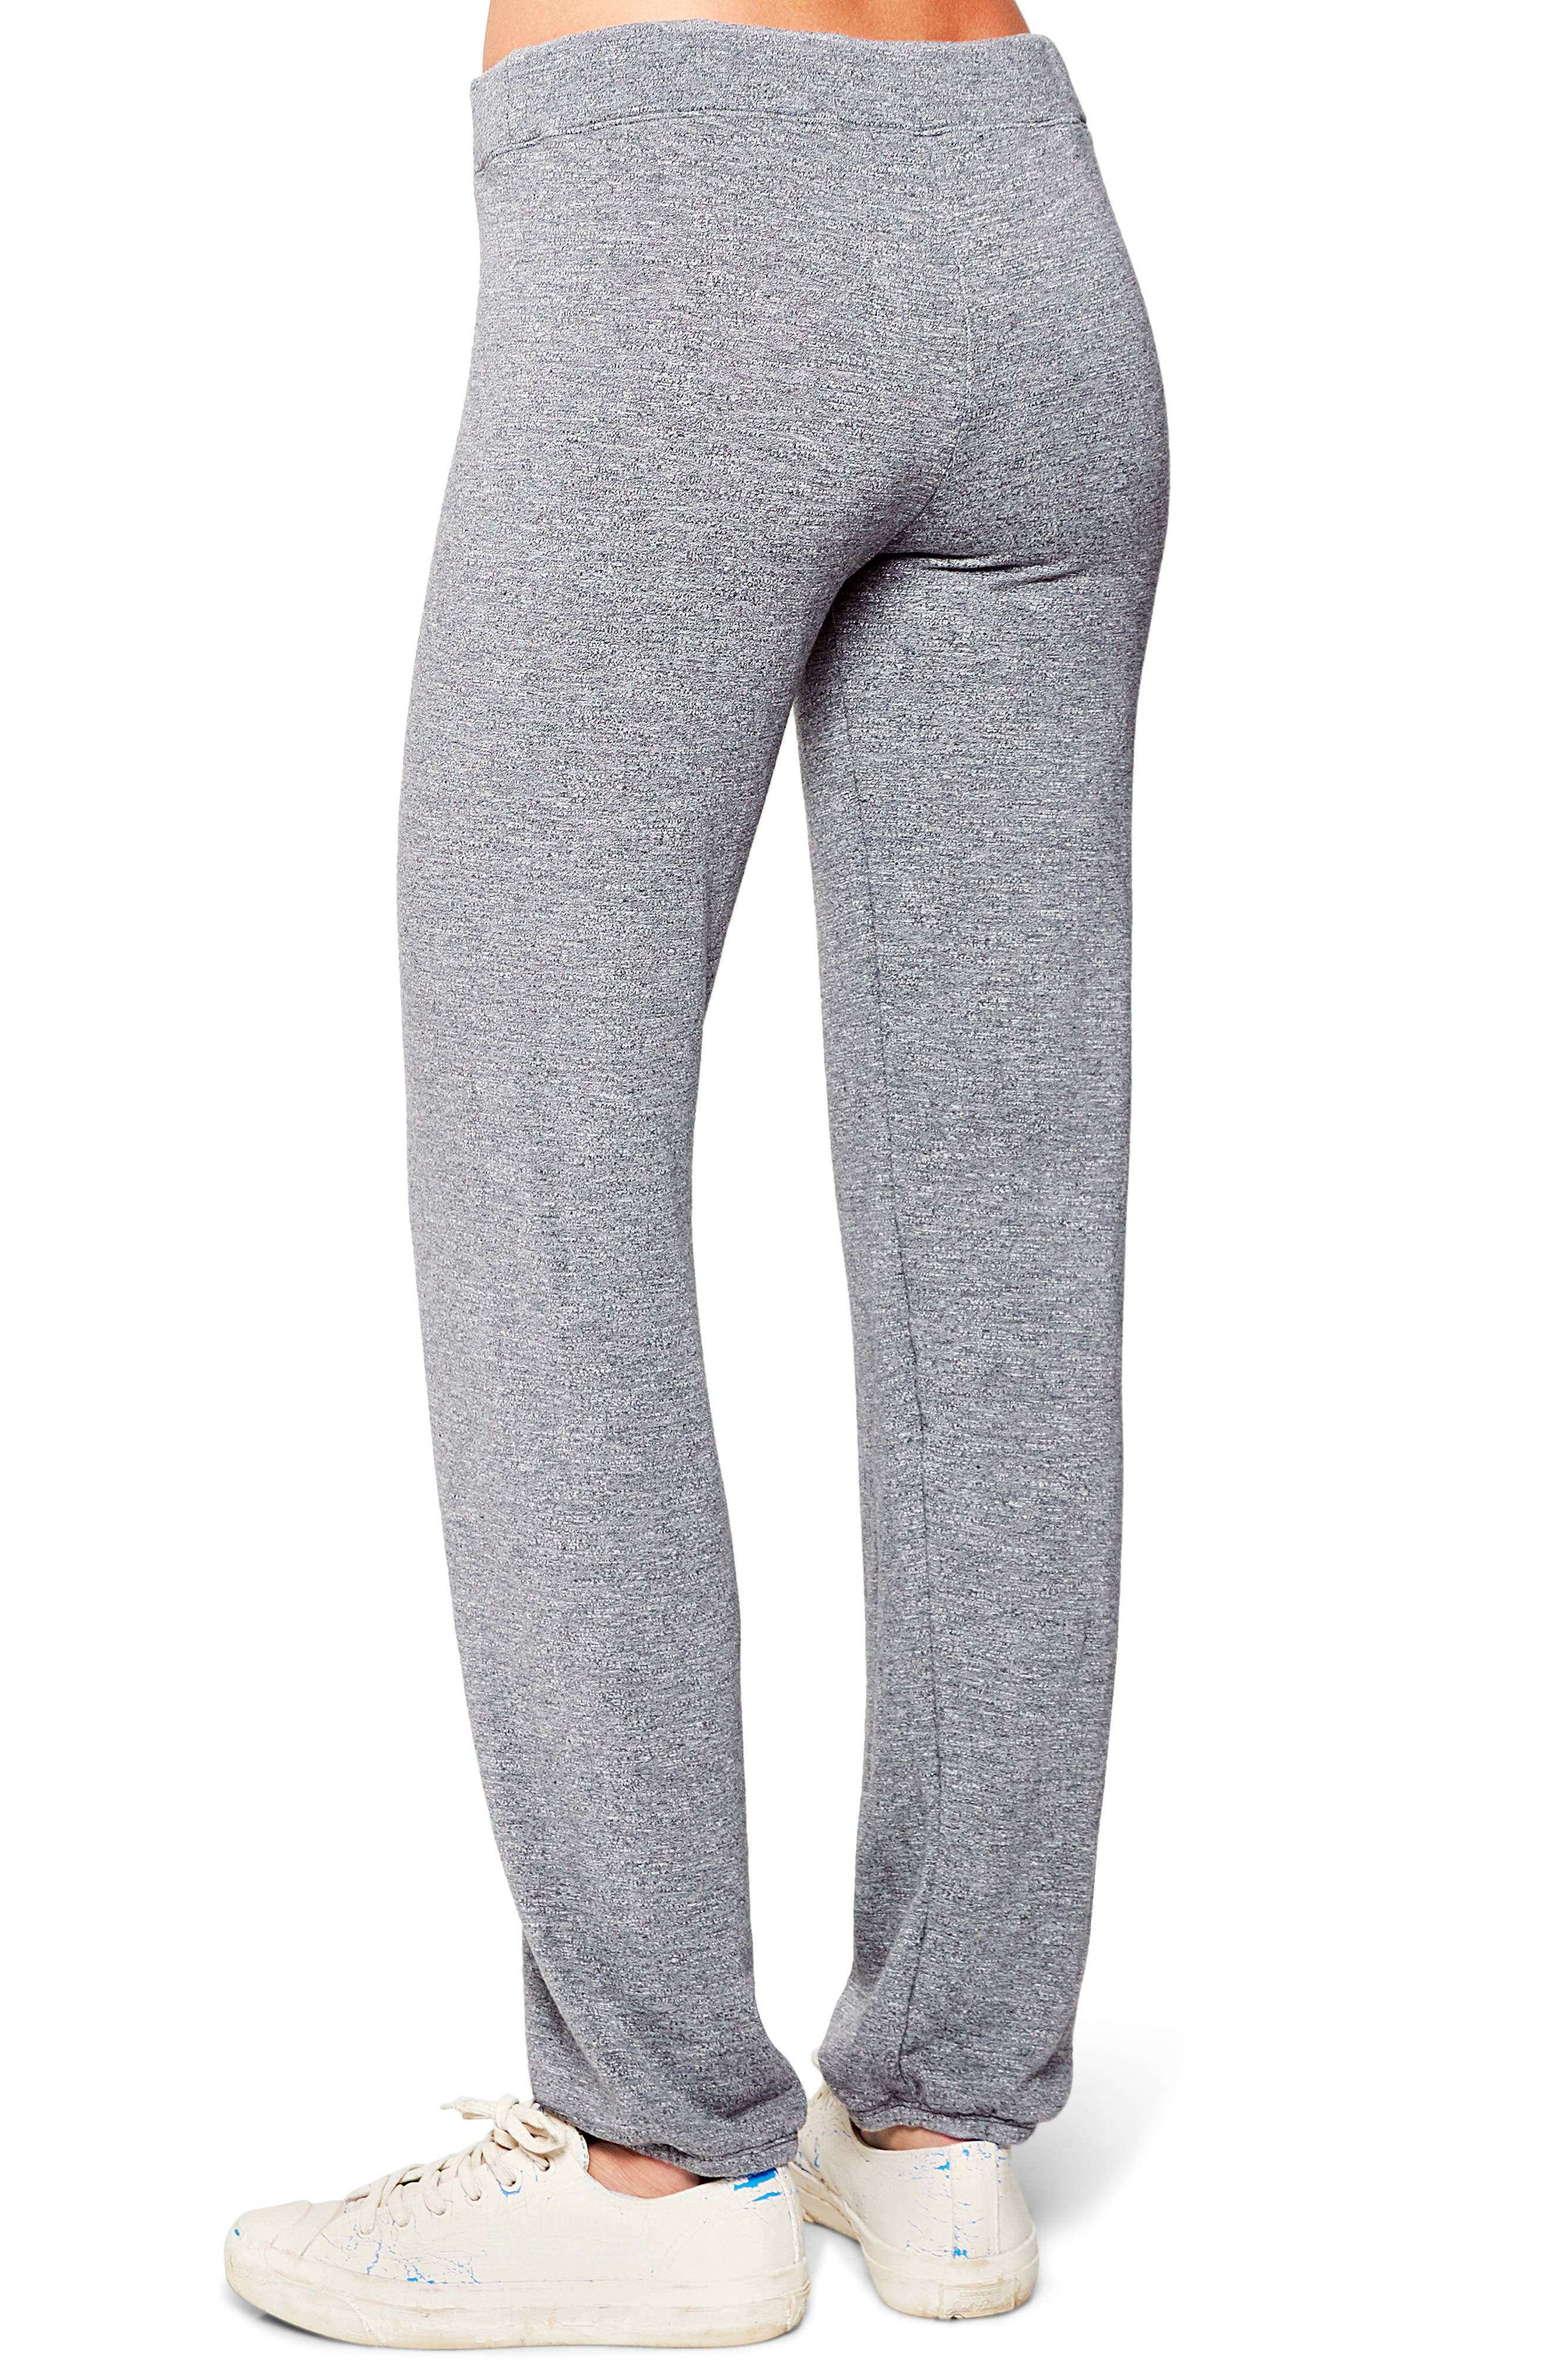 Fleece Sweatpants,                             Alternate thumbnail 2, color,                             HEATHER GREY